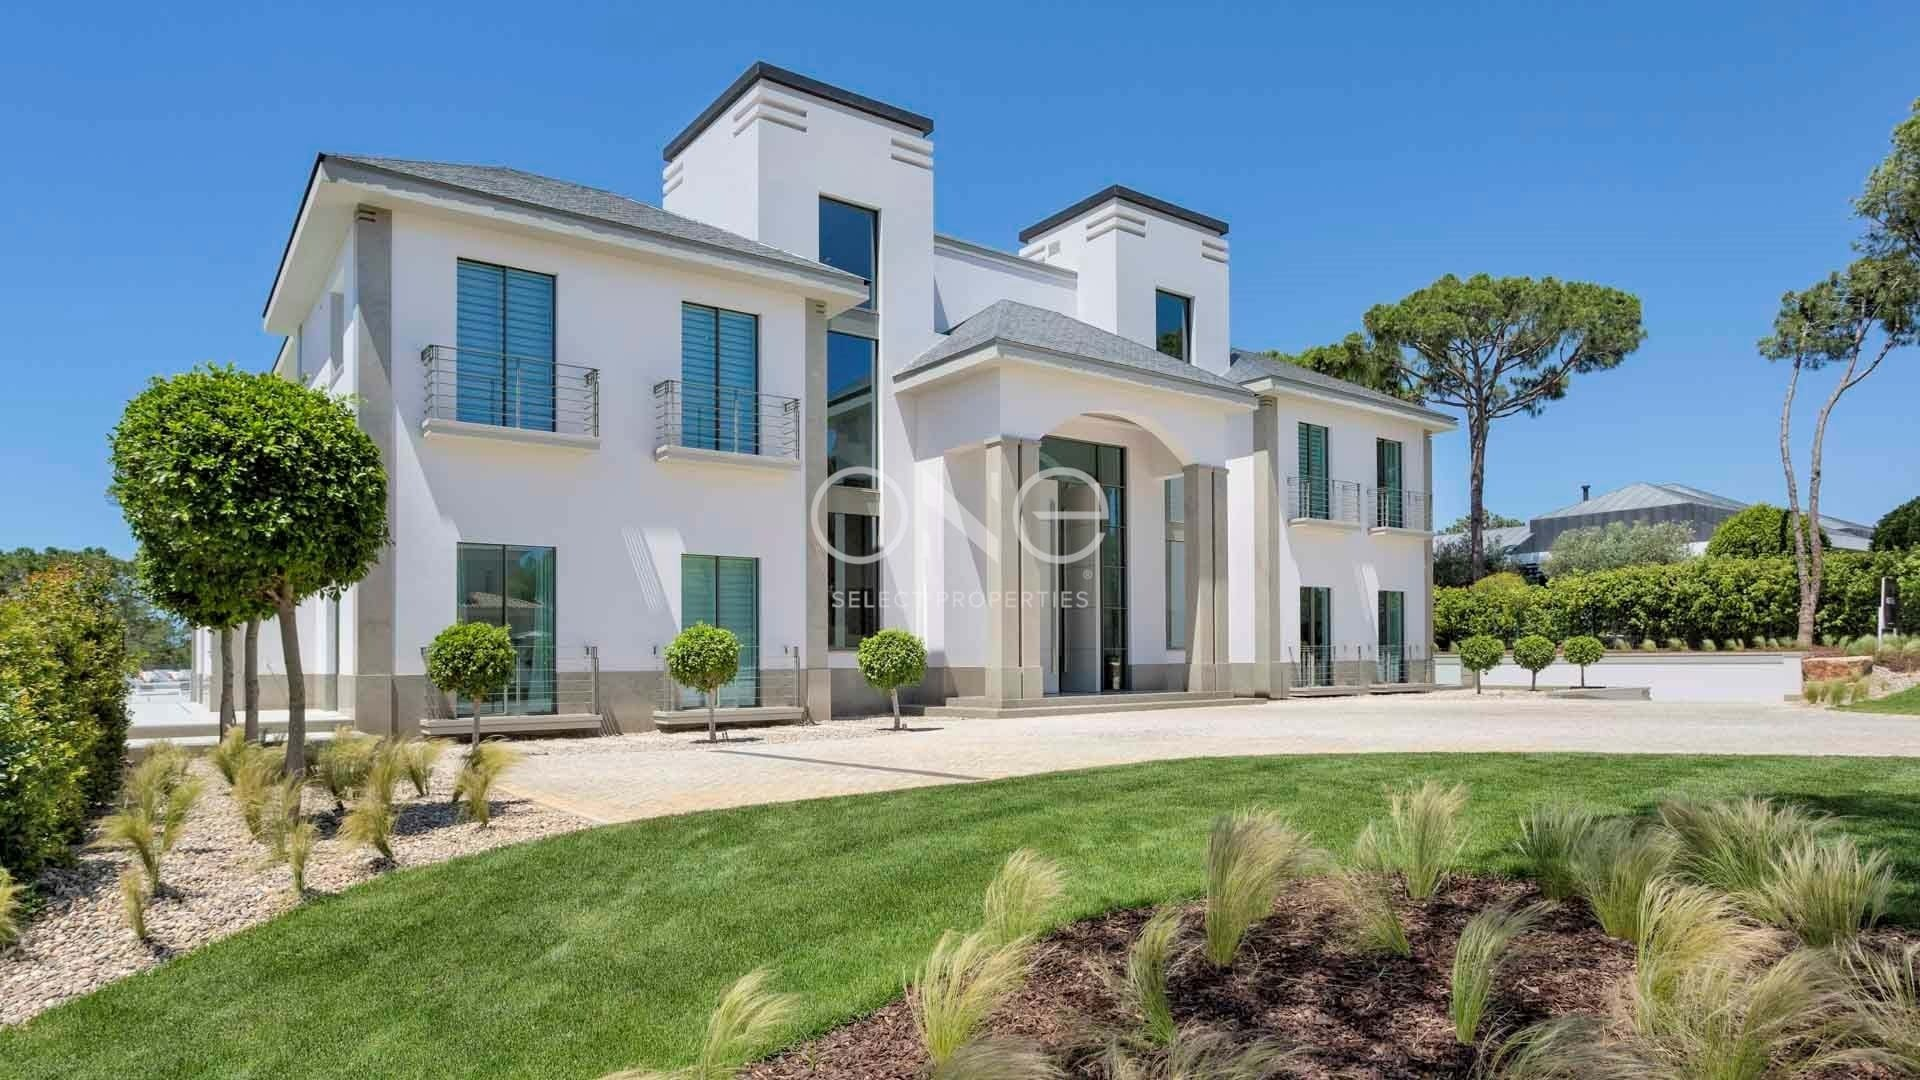 Villa in Almancil, Algarve, Portugal 1 - 11534021